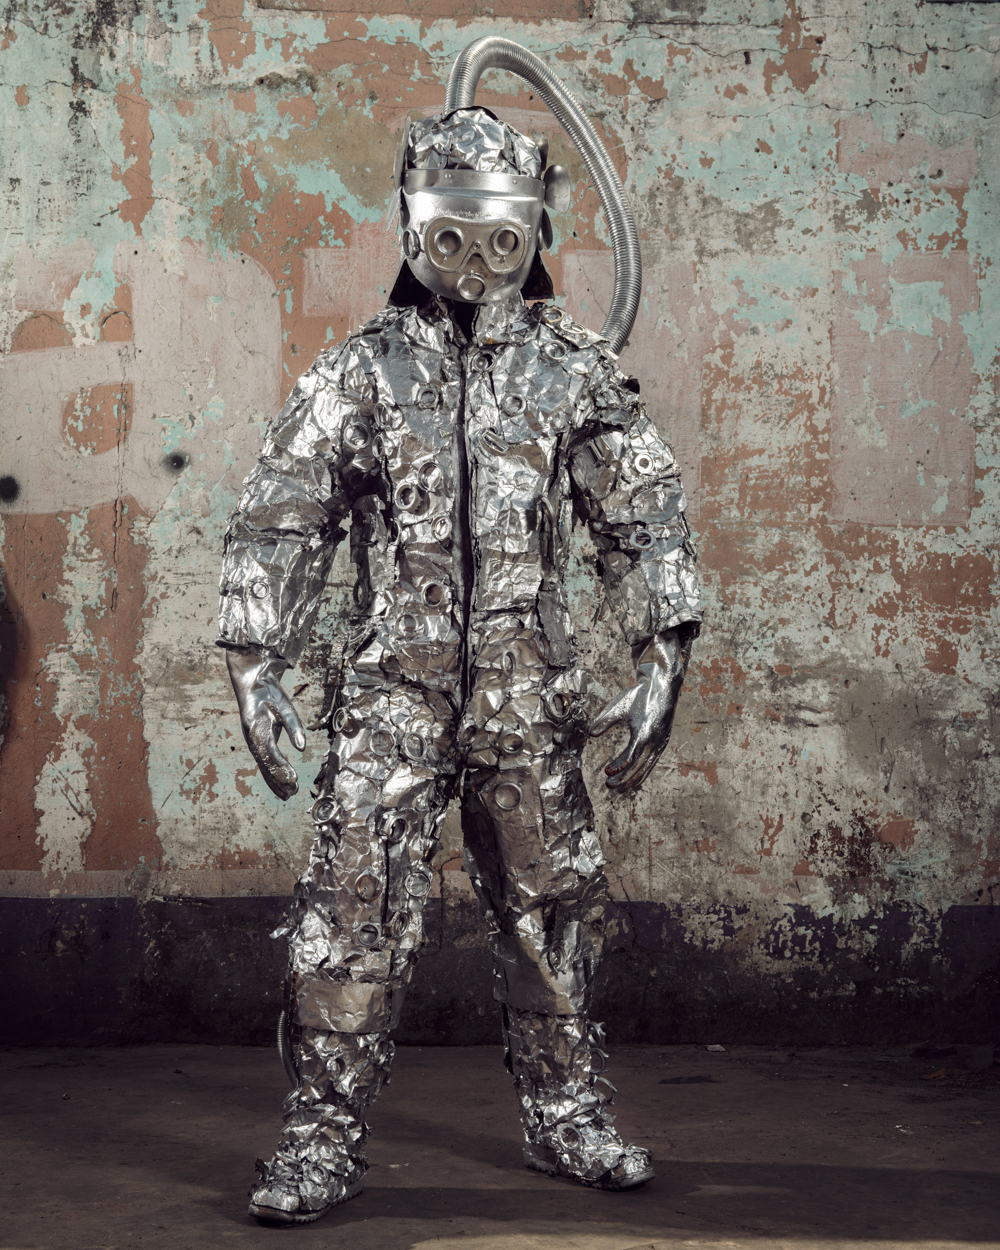 Untitled #12, 2020 Homo Detritus, Real Portraitik #5 Kinshasa, RDC ©Stephan Gladieu